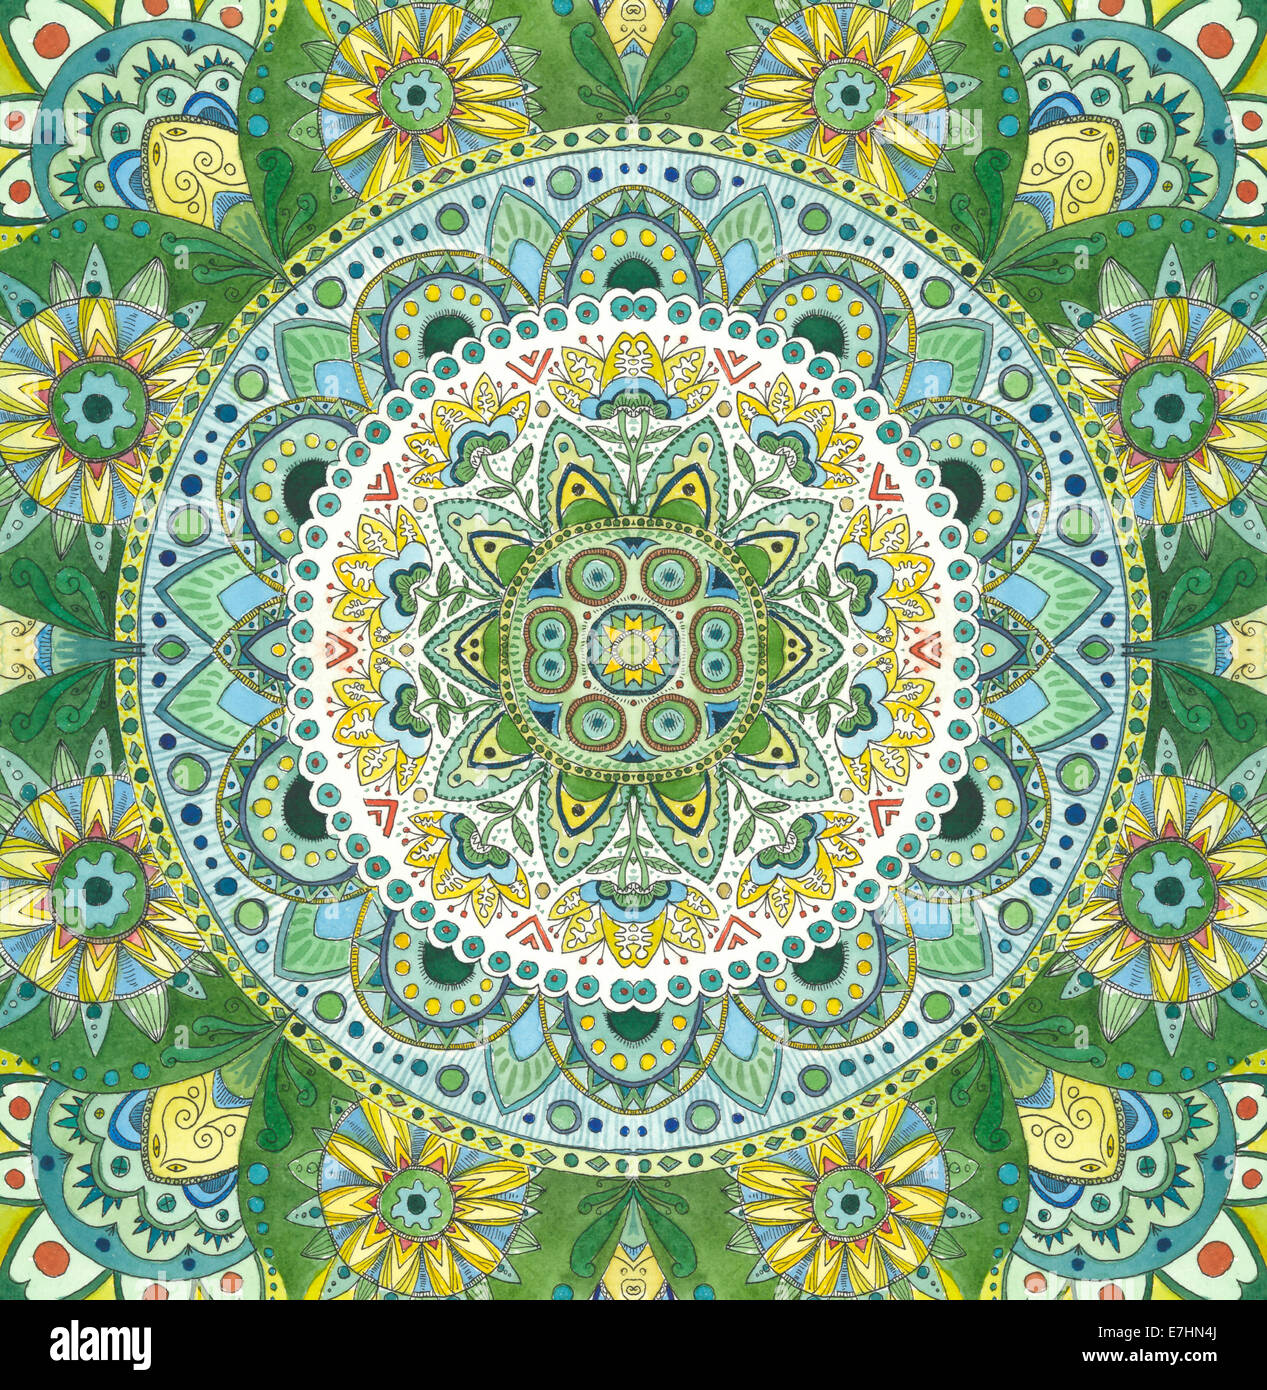 Green Mandala - Stock Image